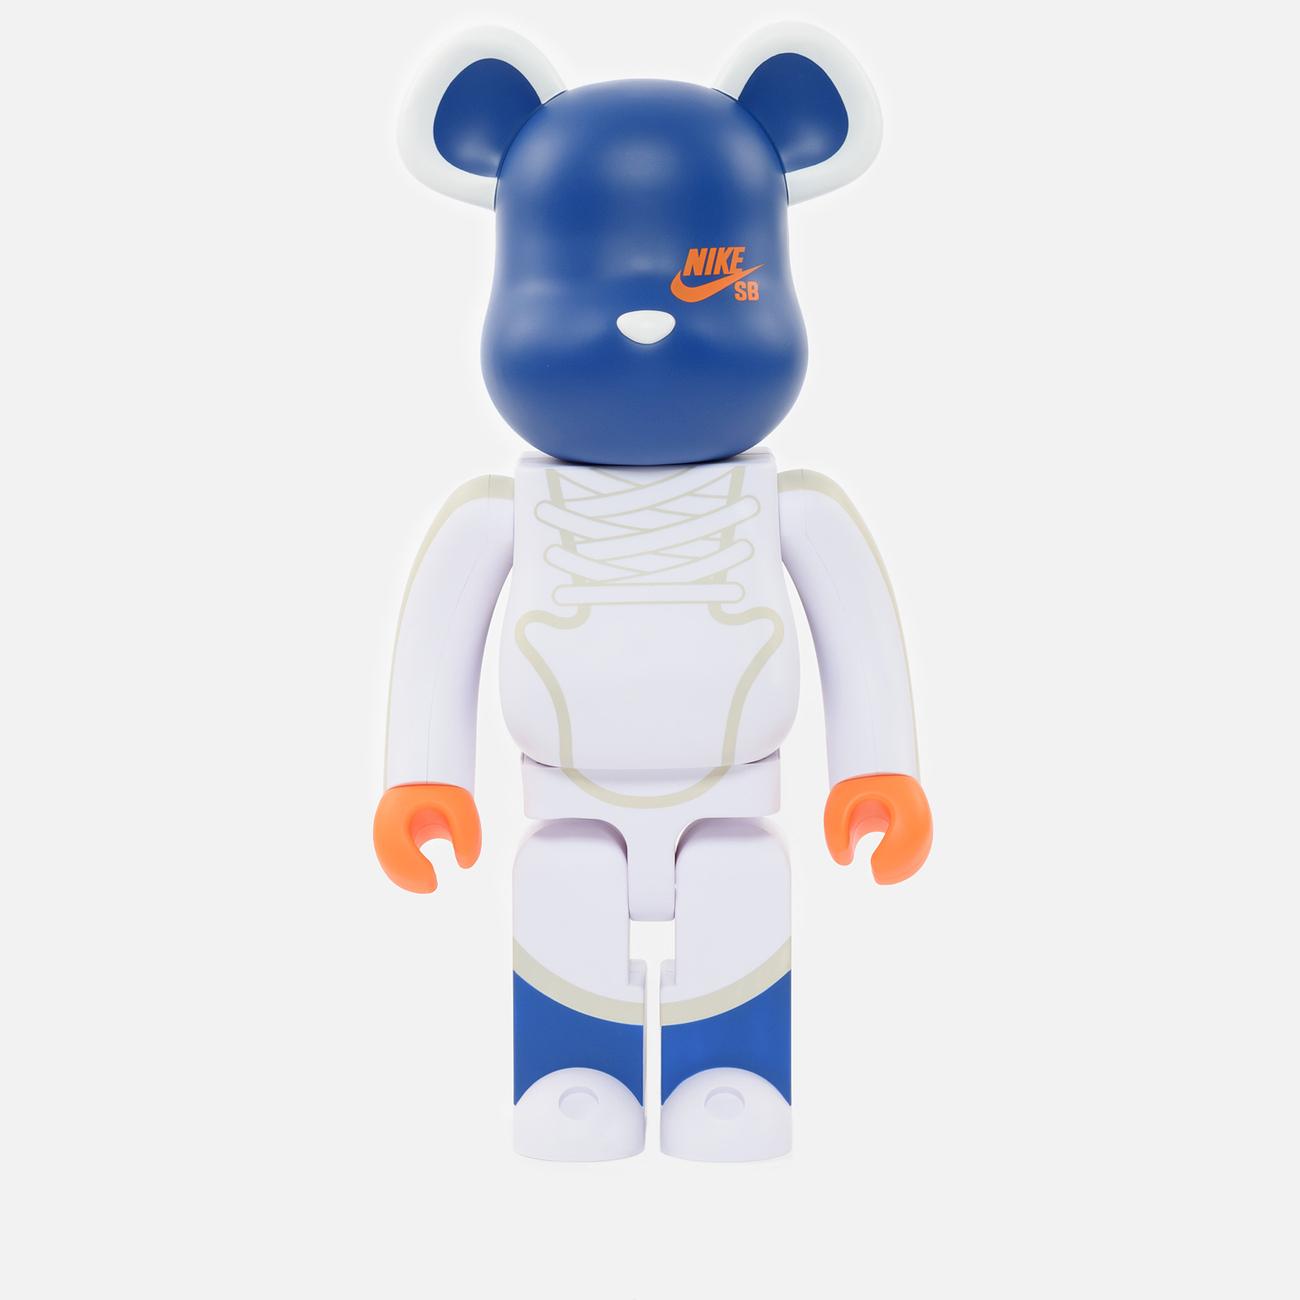 Игрушка Medicom Toy Bearbrick Nike SB White 1000%